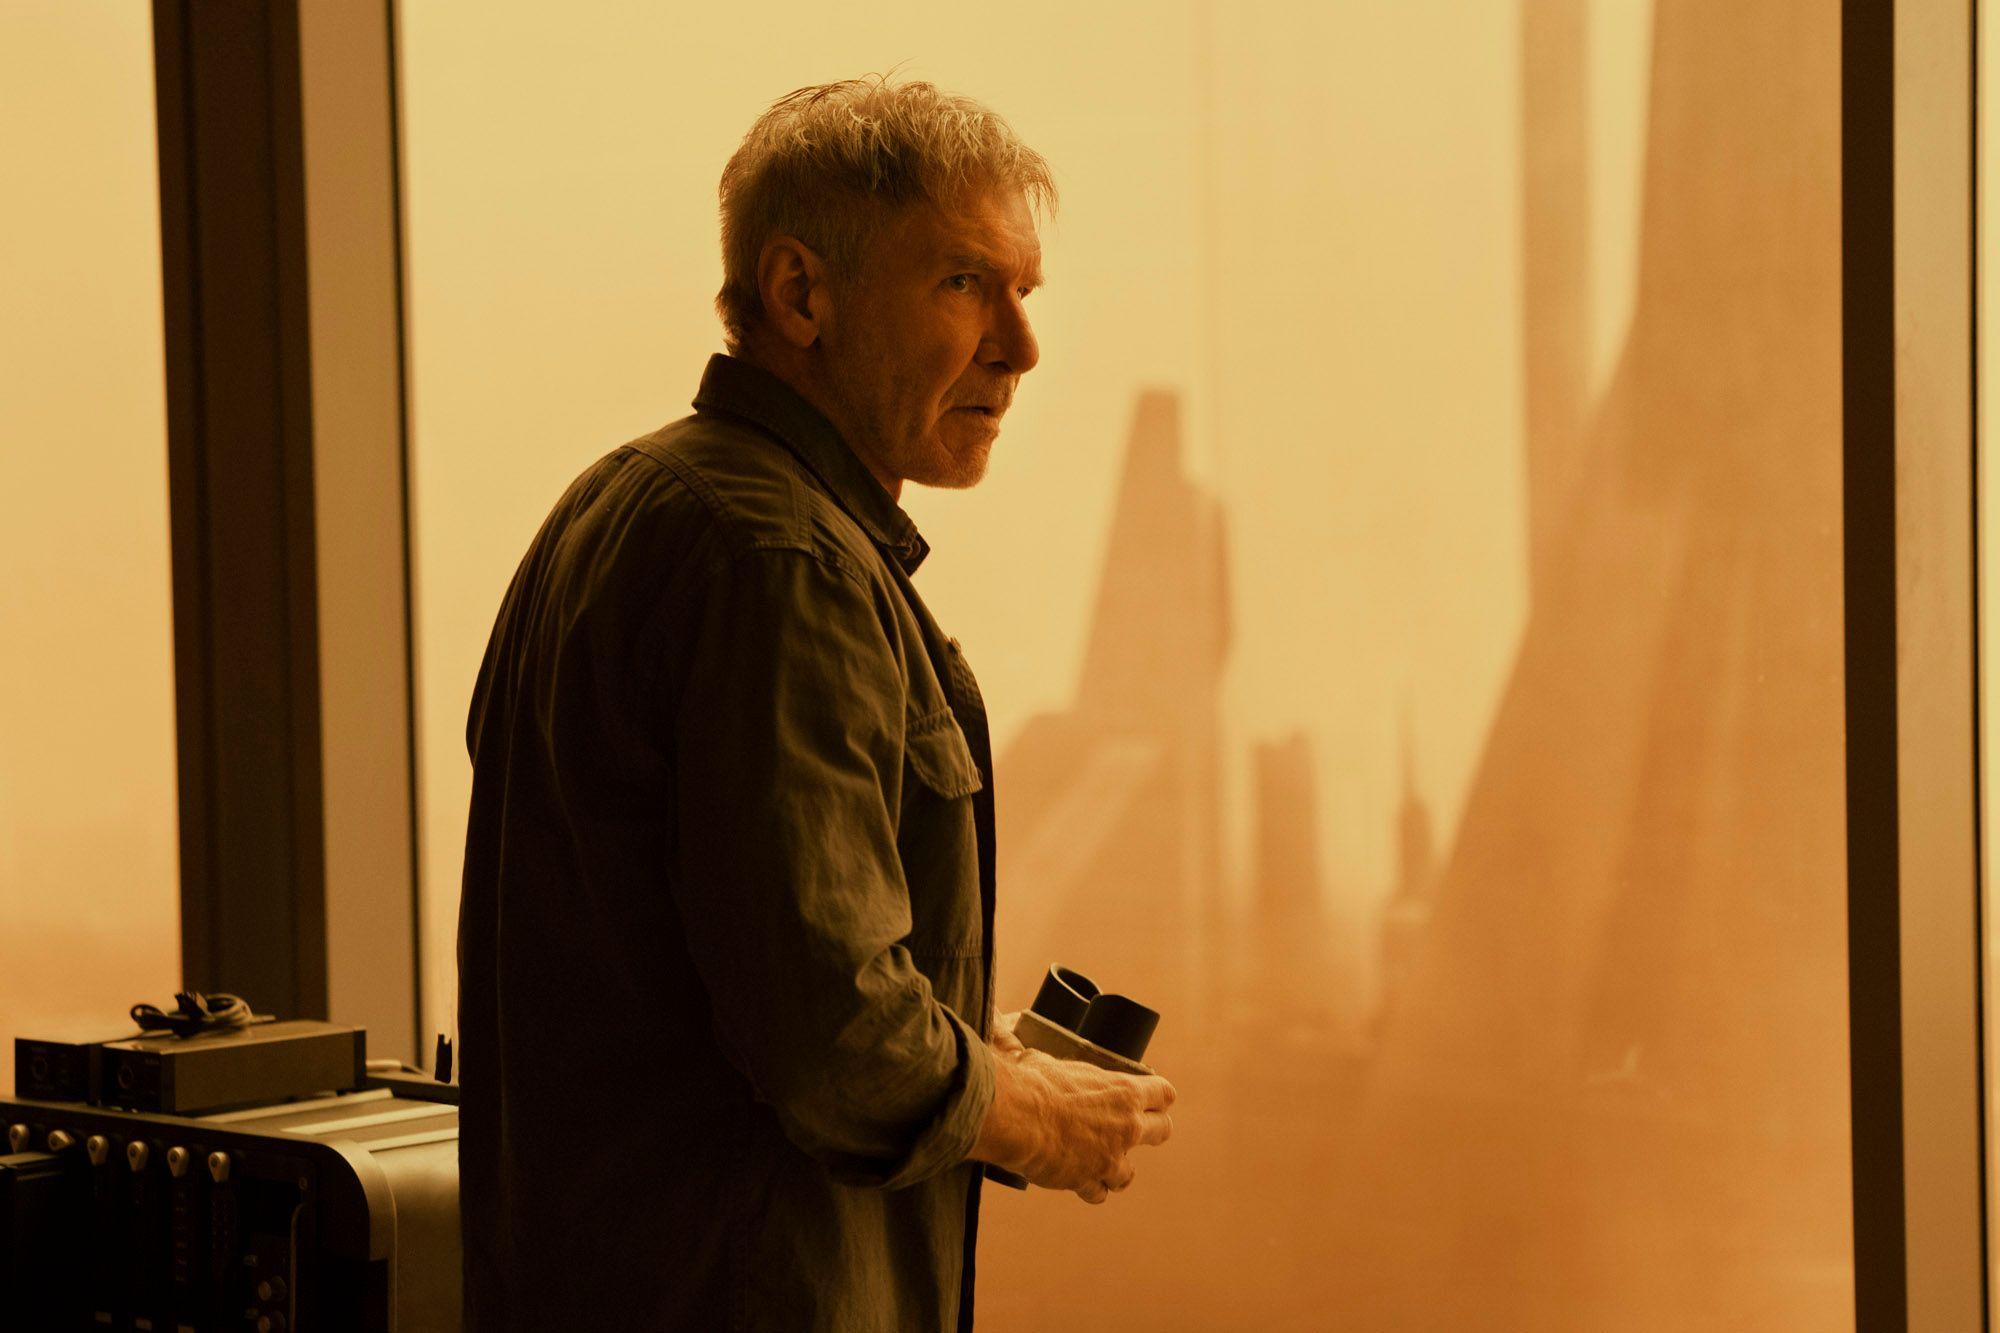 Blade Runner 2049 Ending Explained - The Power of Choice ... - photo#42